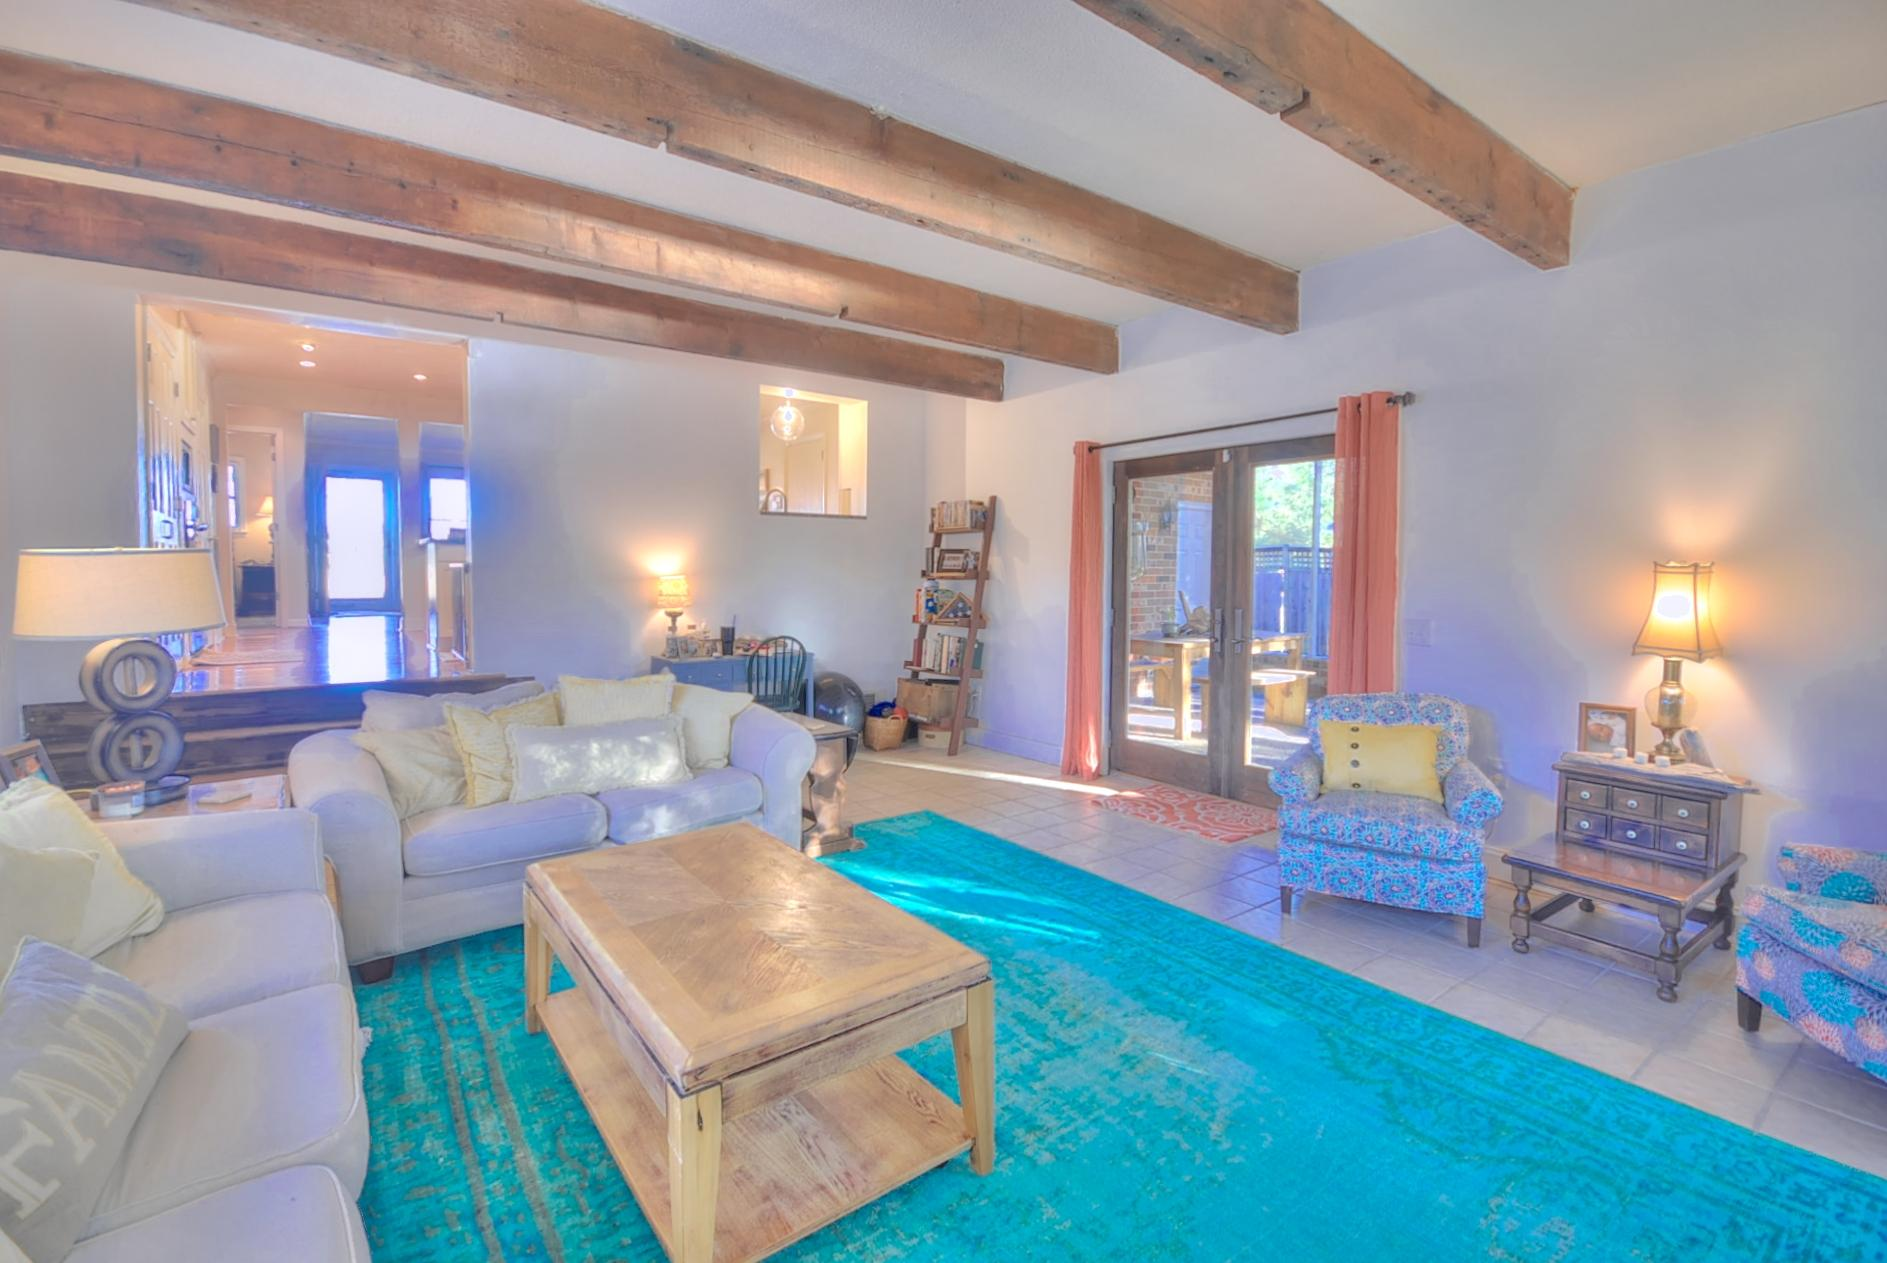 Capri Isles Homes For Sale - 213 Wappoo, Charleston, SC - 25